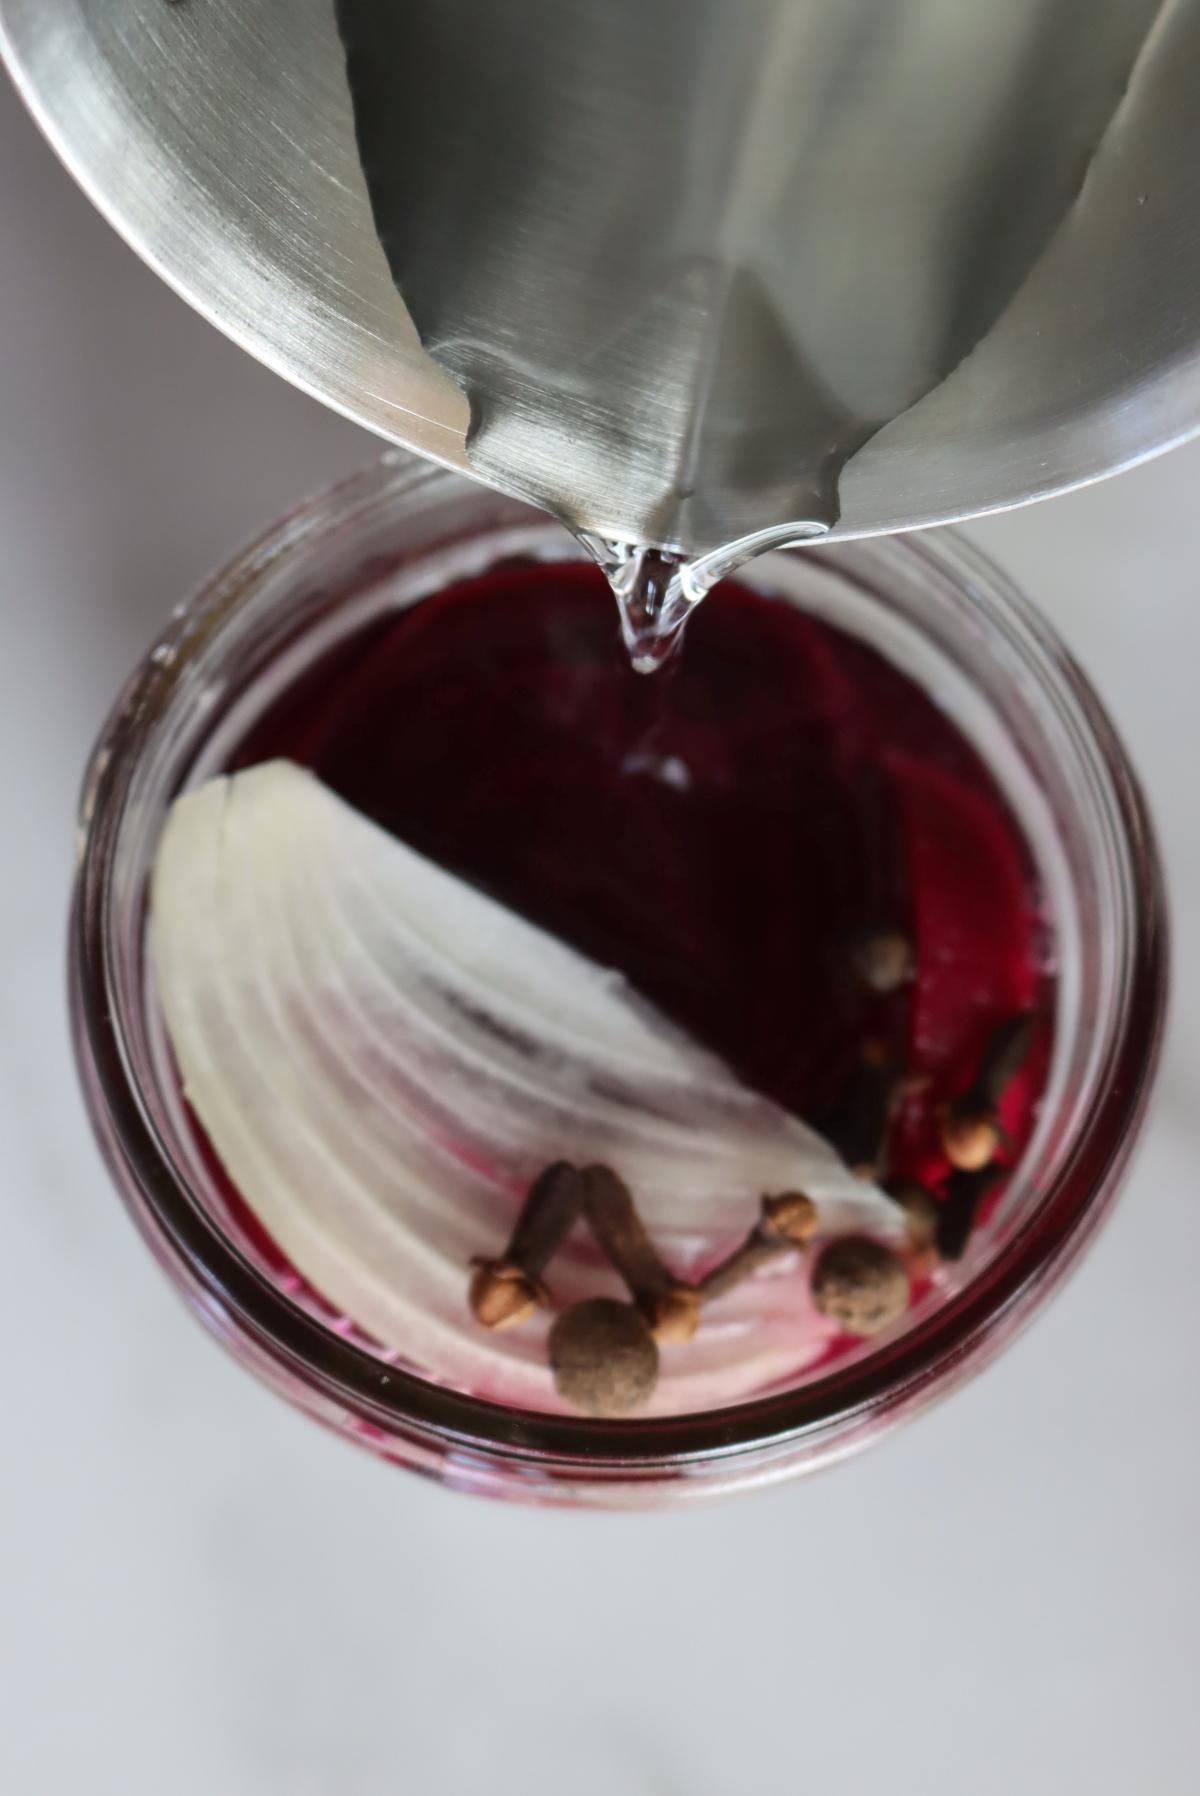 Brine for Pickled Beets